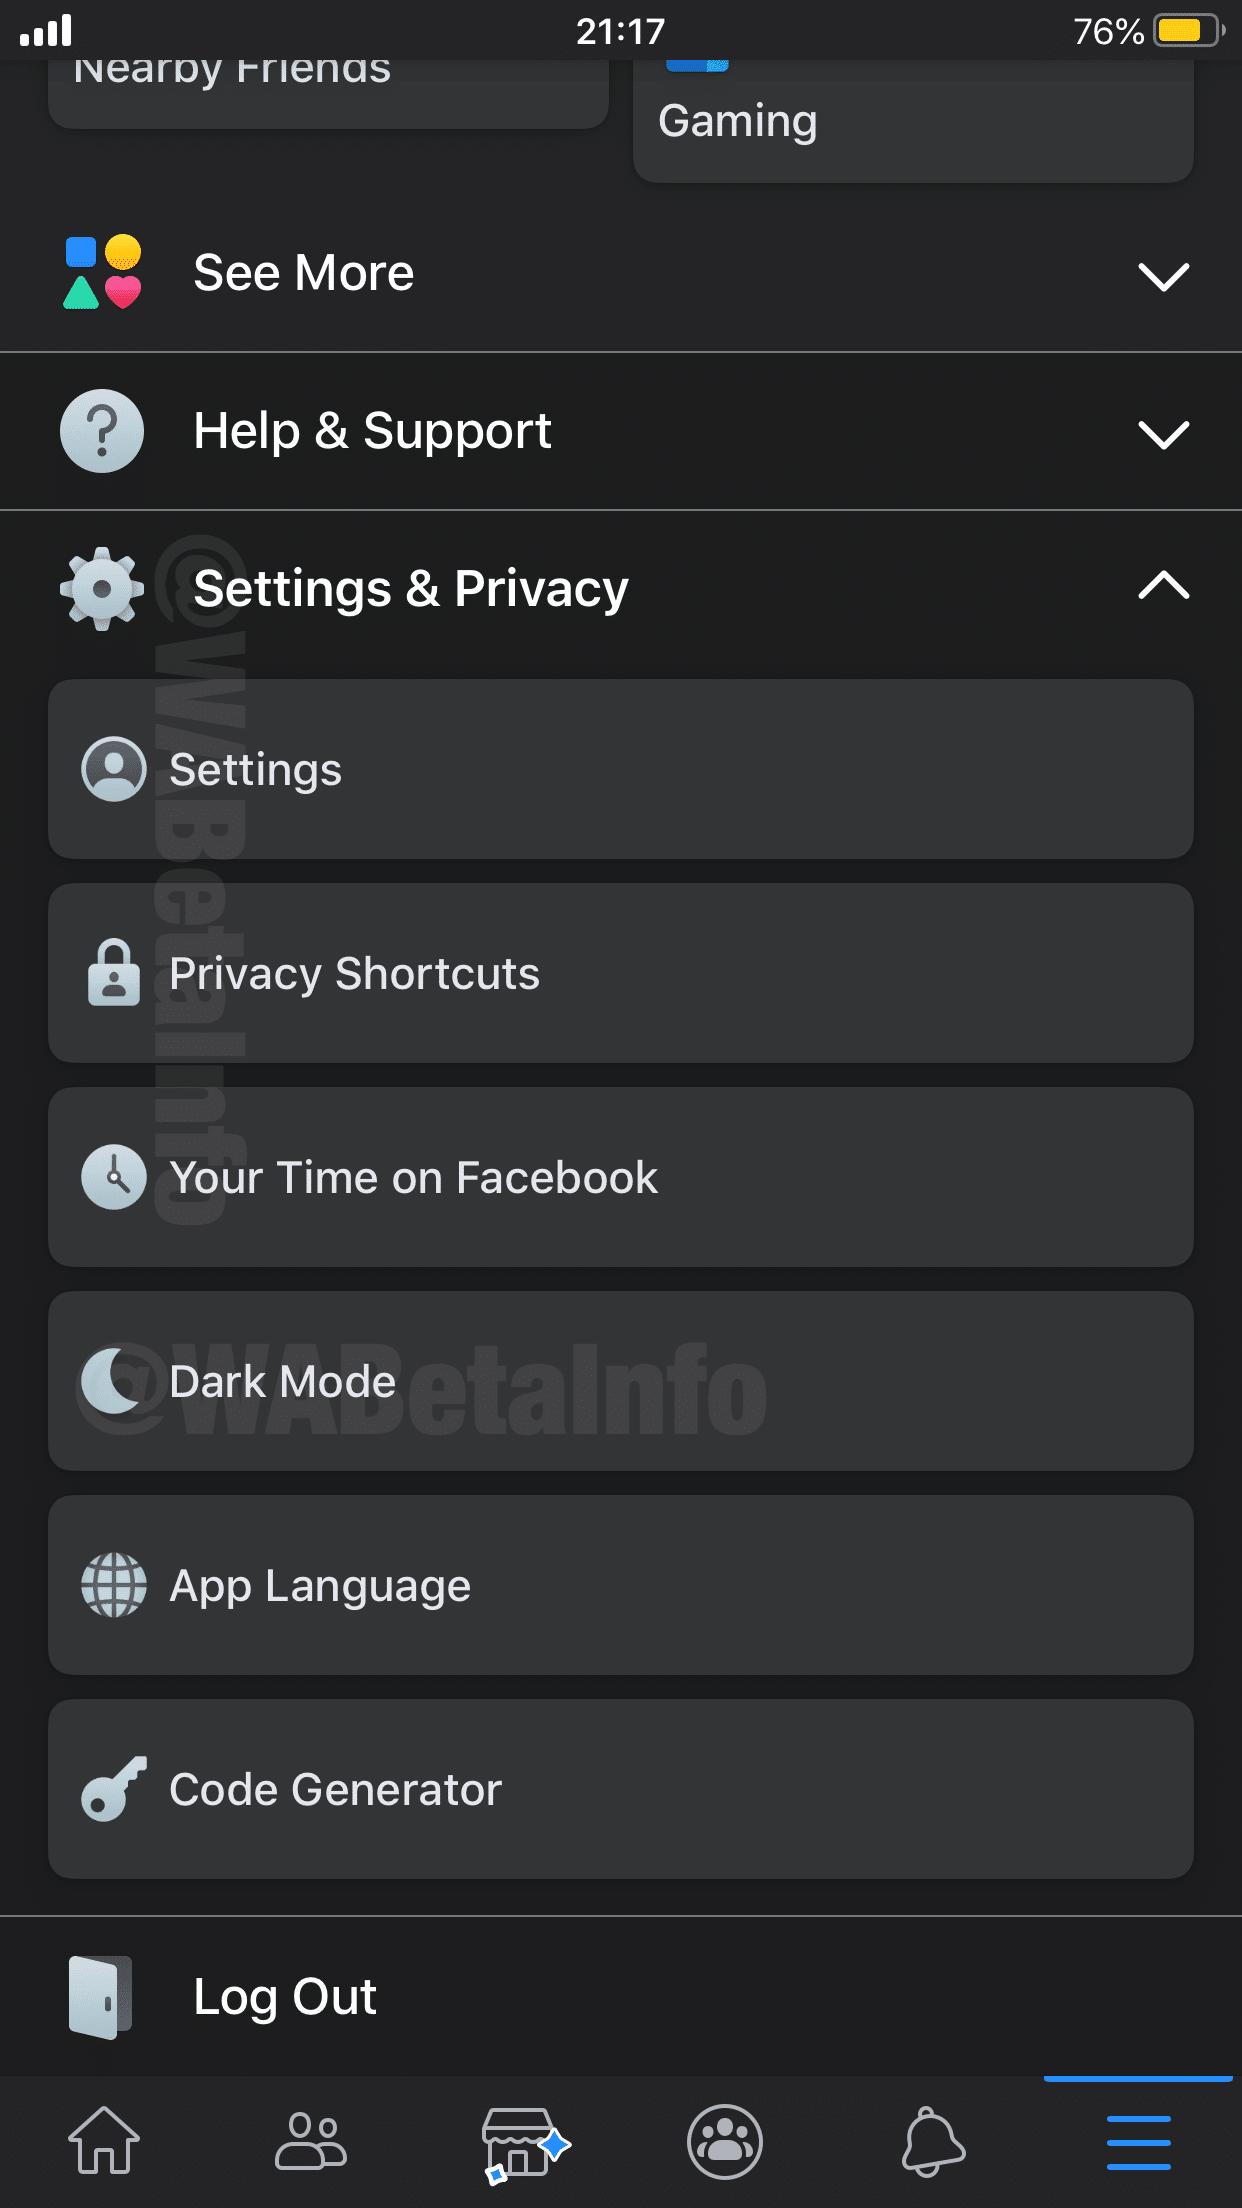 Modo Escuro no app Facebook para iOS